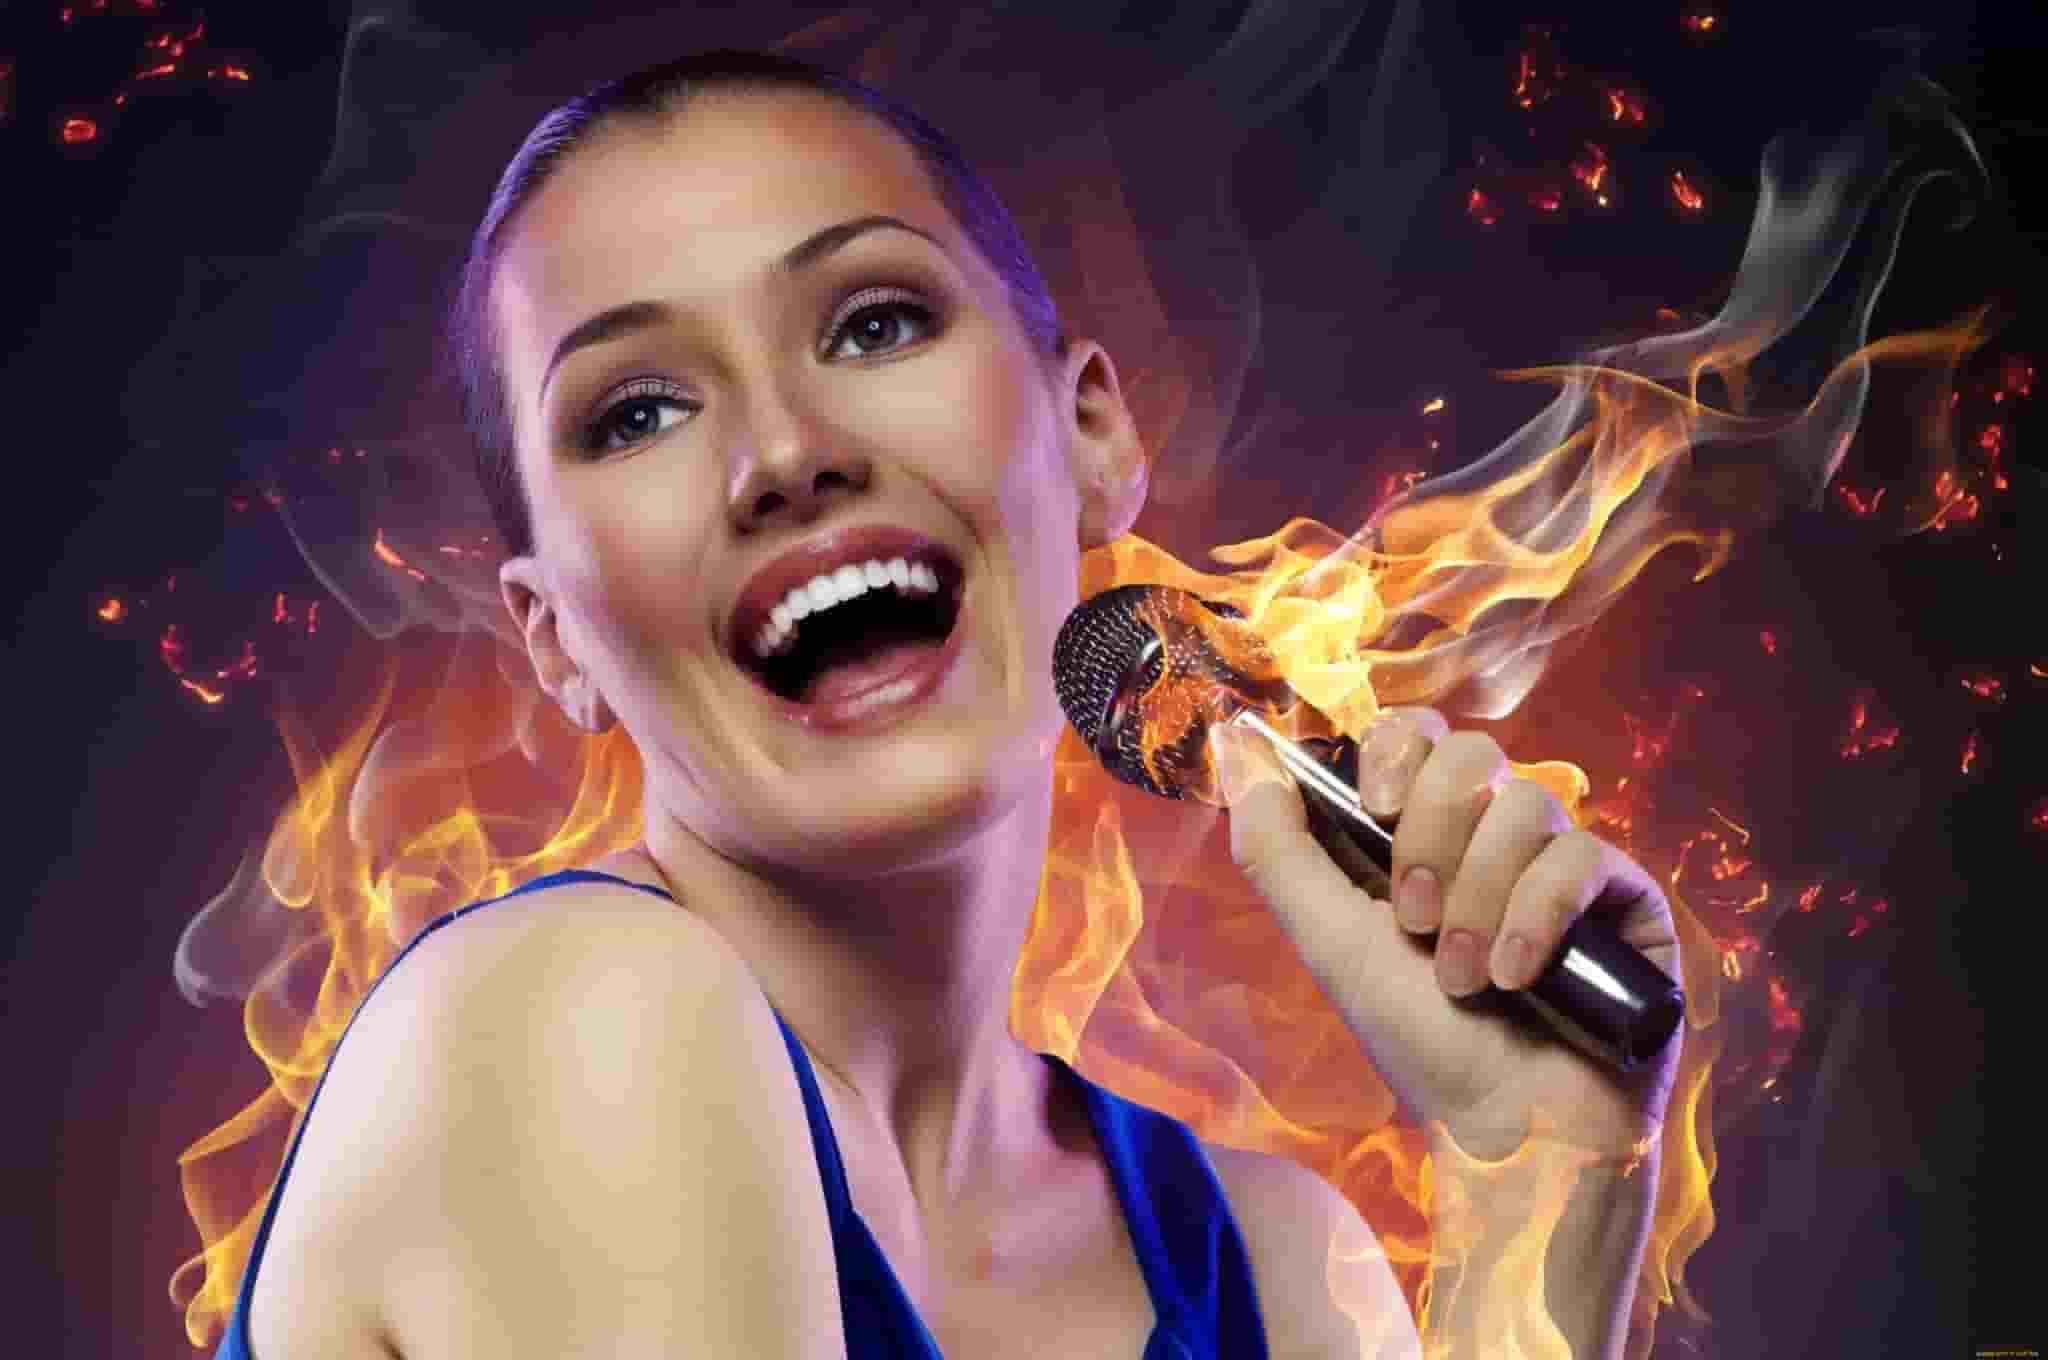 karaoke-min-min+-min-min